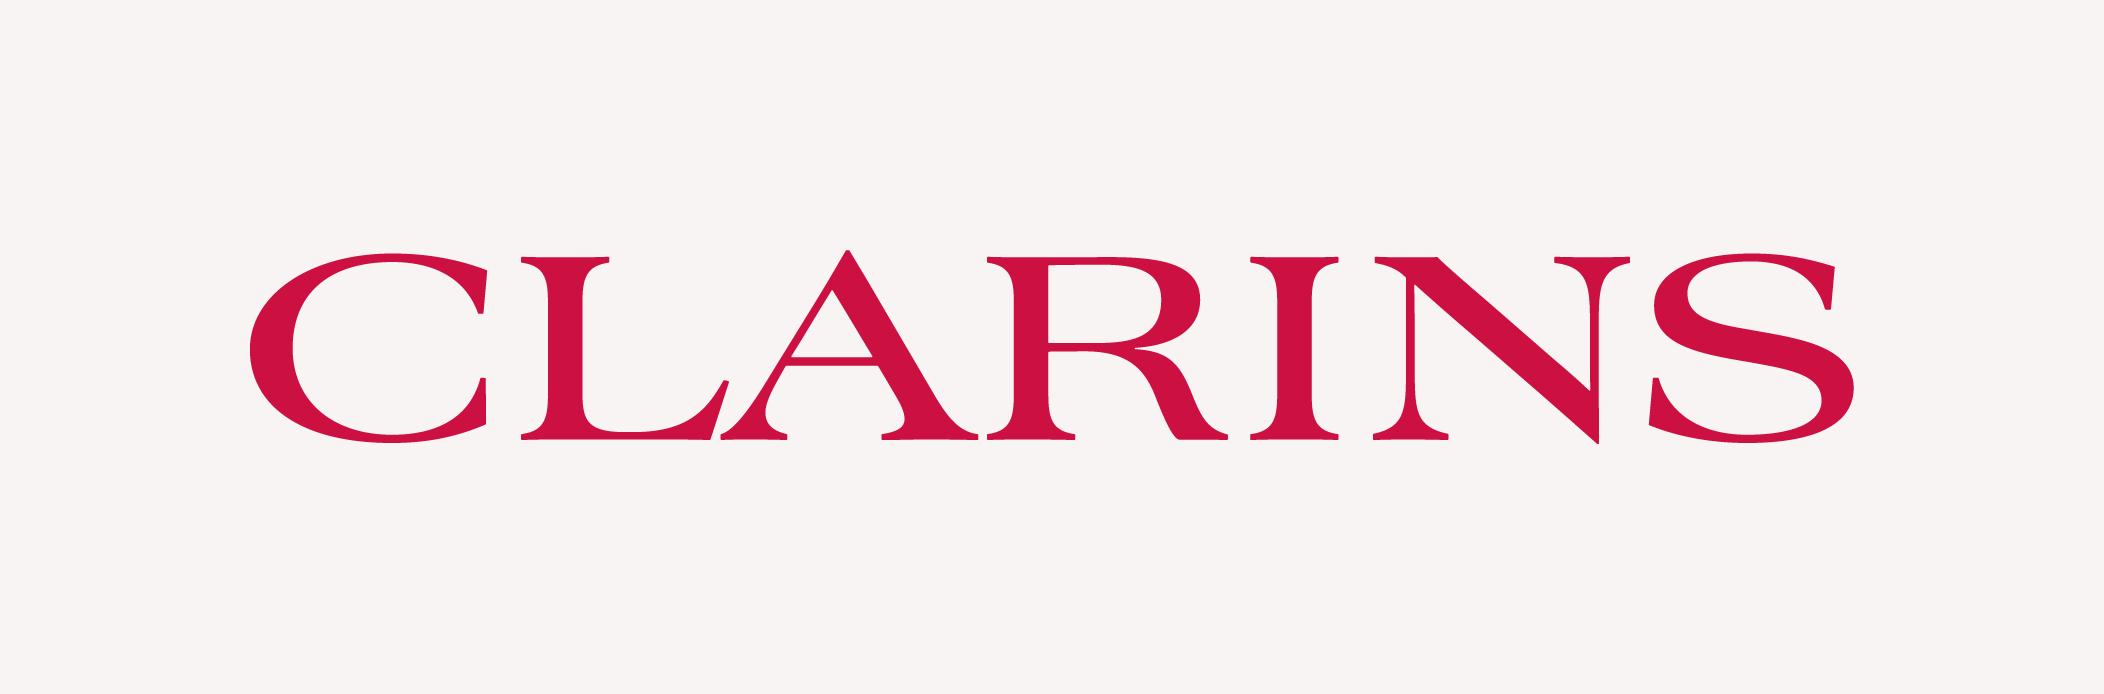 Clarins red logo-w-bckgrnd.png